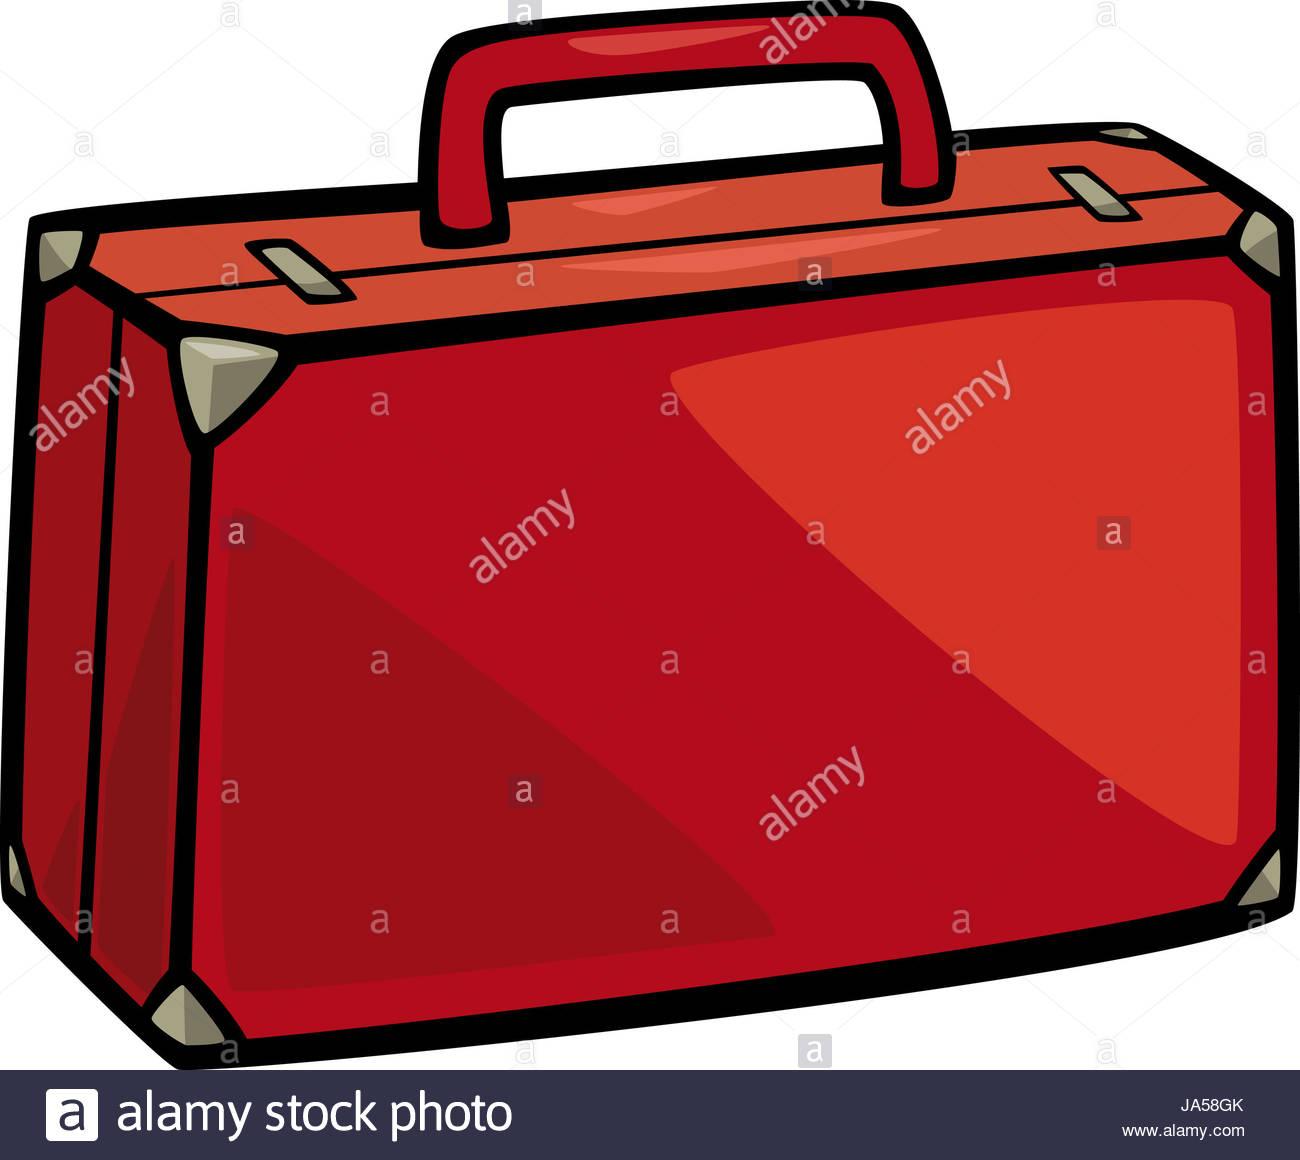 1300x1160 Cartoon Illustration Of Suitcase Clip Art Stock Photo 143946003